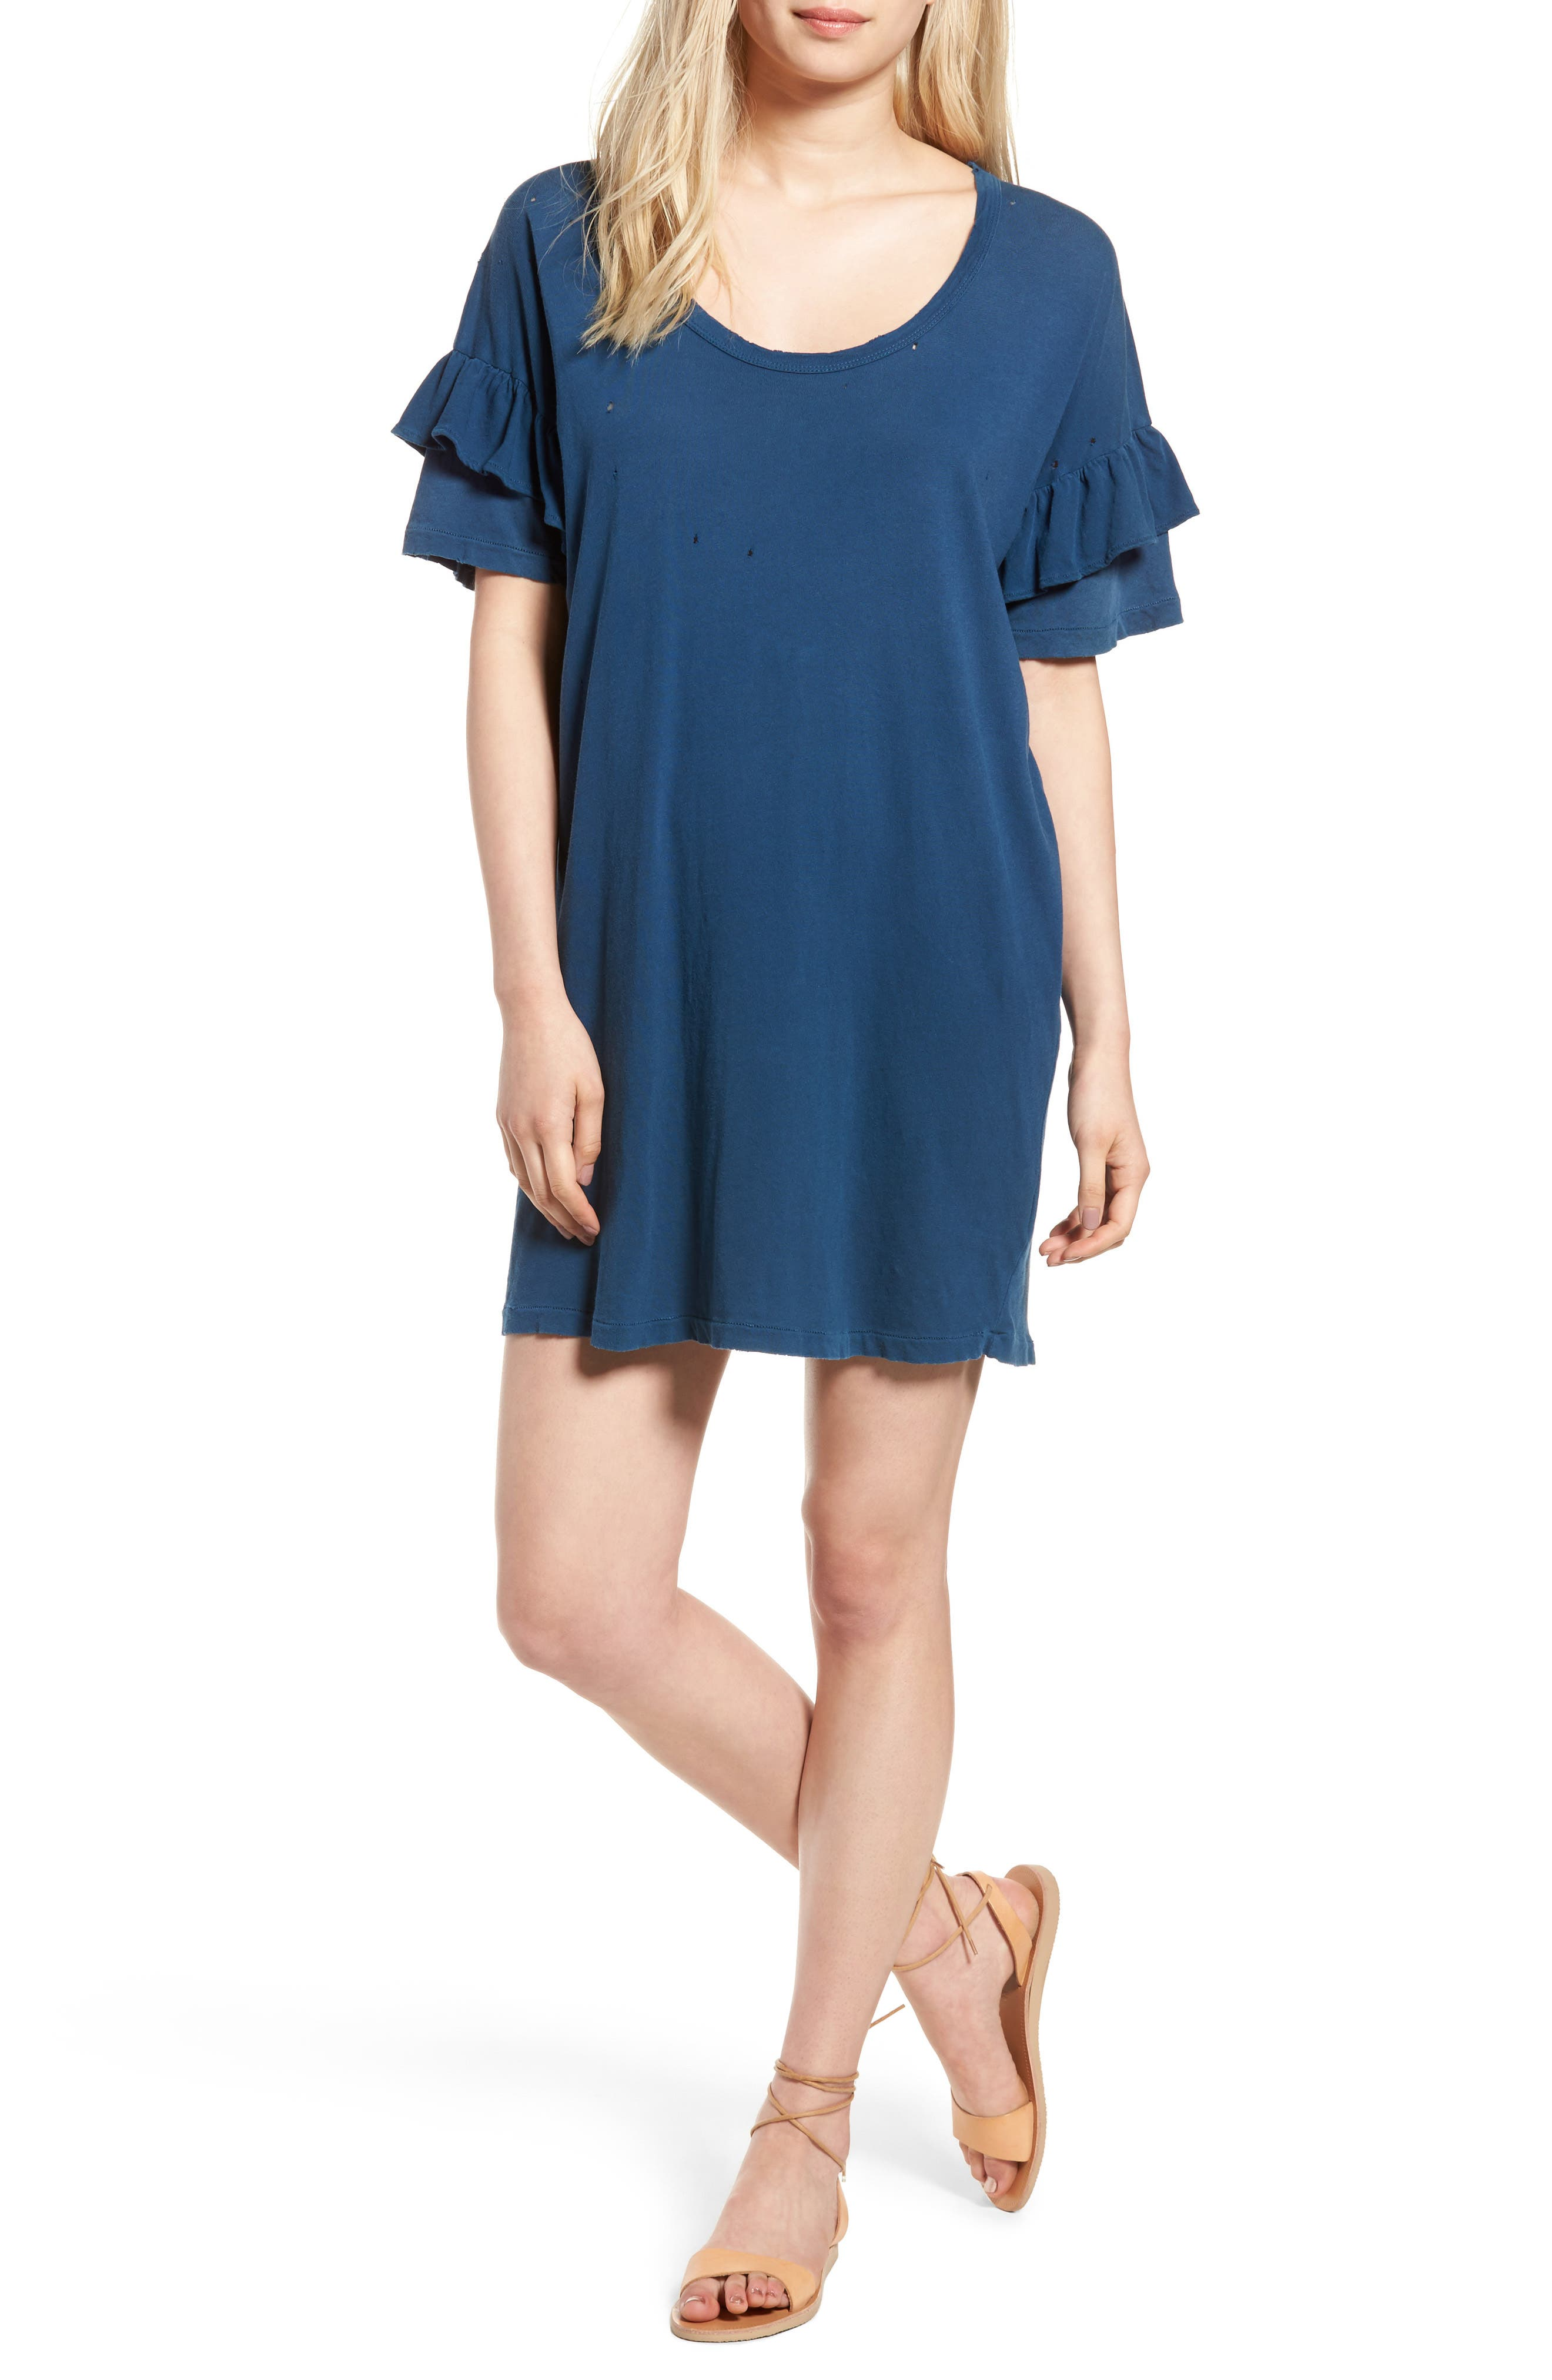 Current/Elliott The Ruffle Roadie T-Shirt Dress